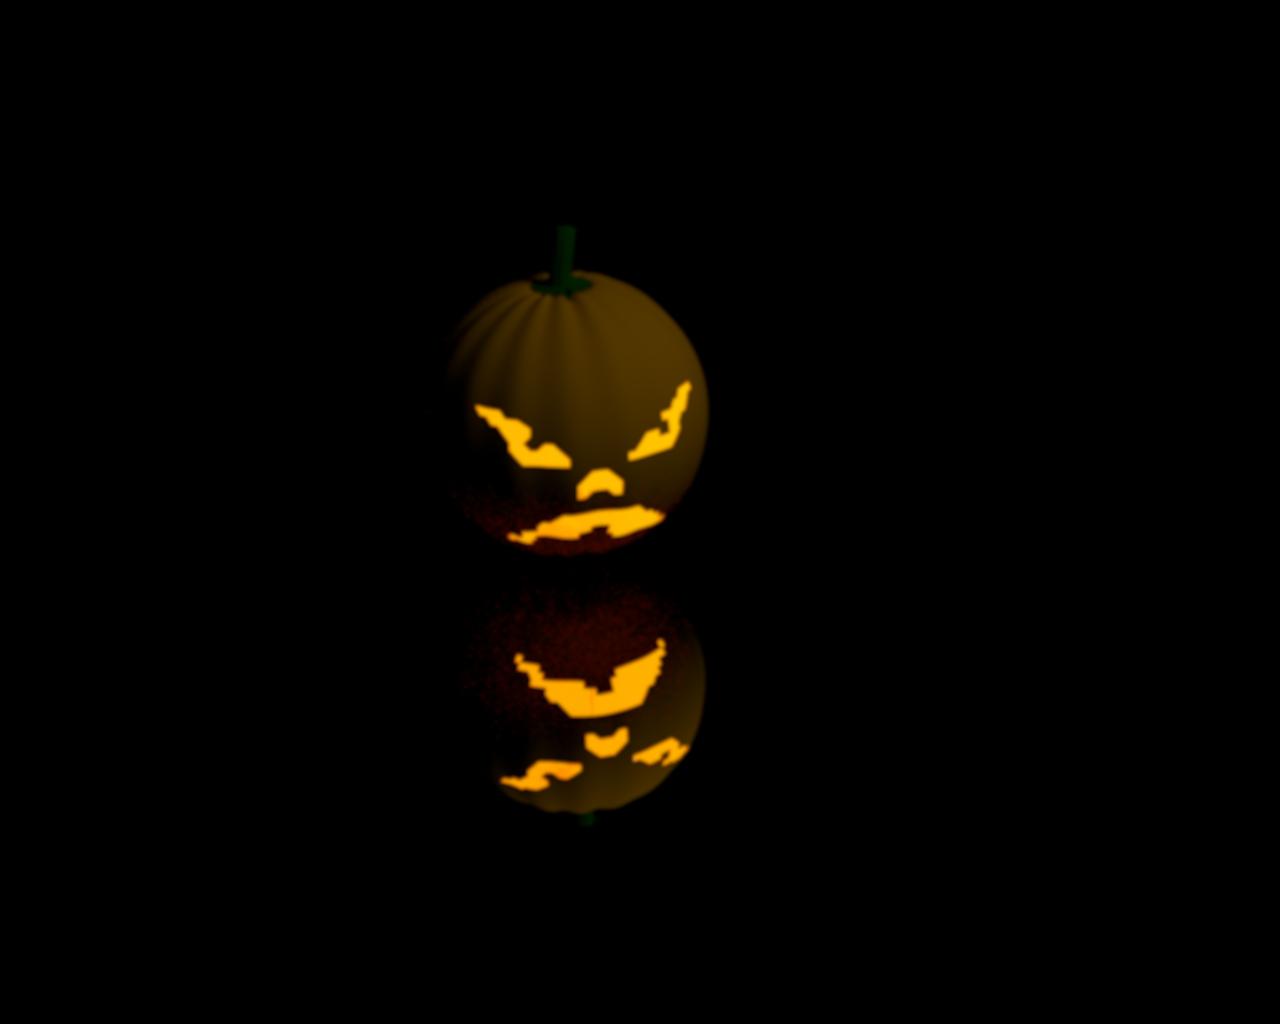 Zucche Di Halloween Terrificanti.Zucca Di Halloween Wallpaper Piziadas Grafica